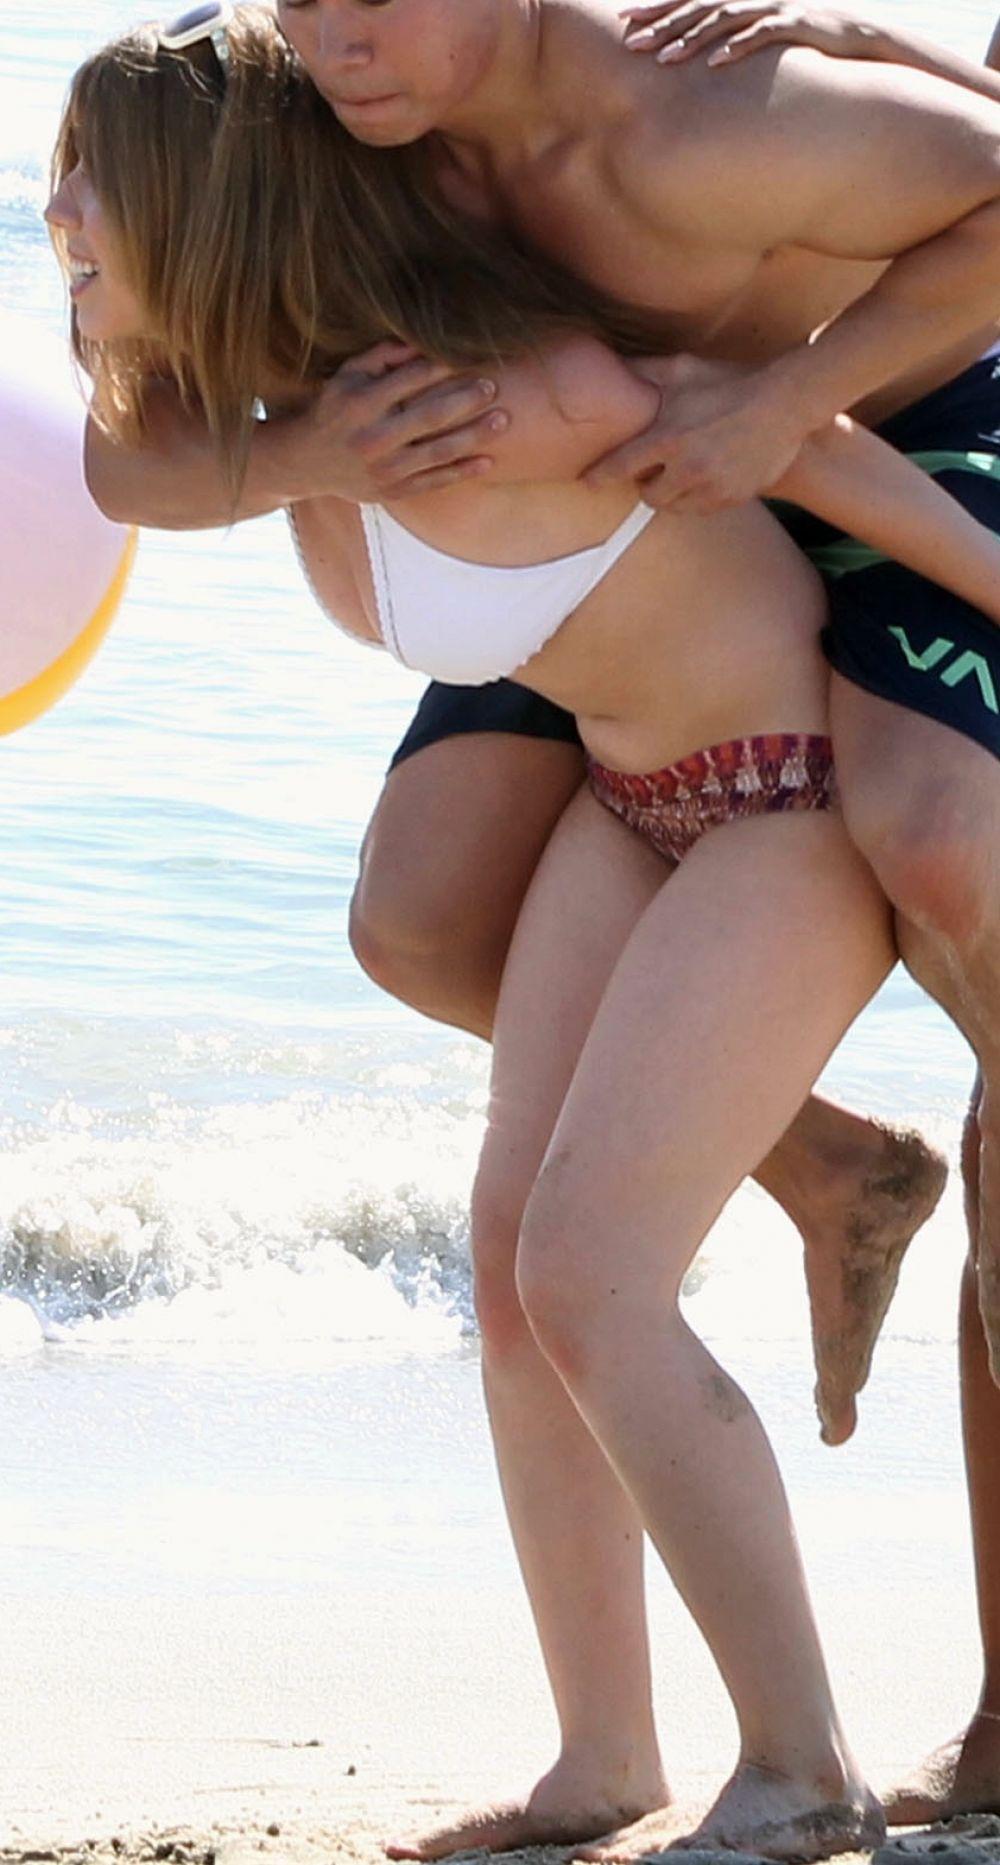 mccurdy bikini Janette